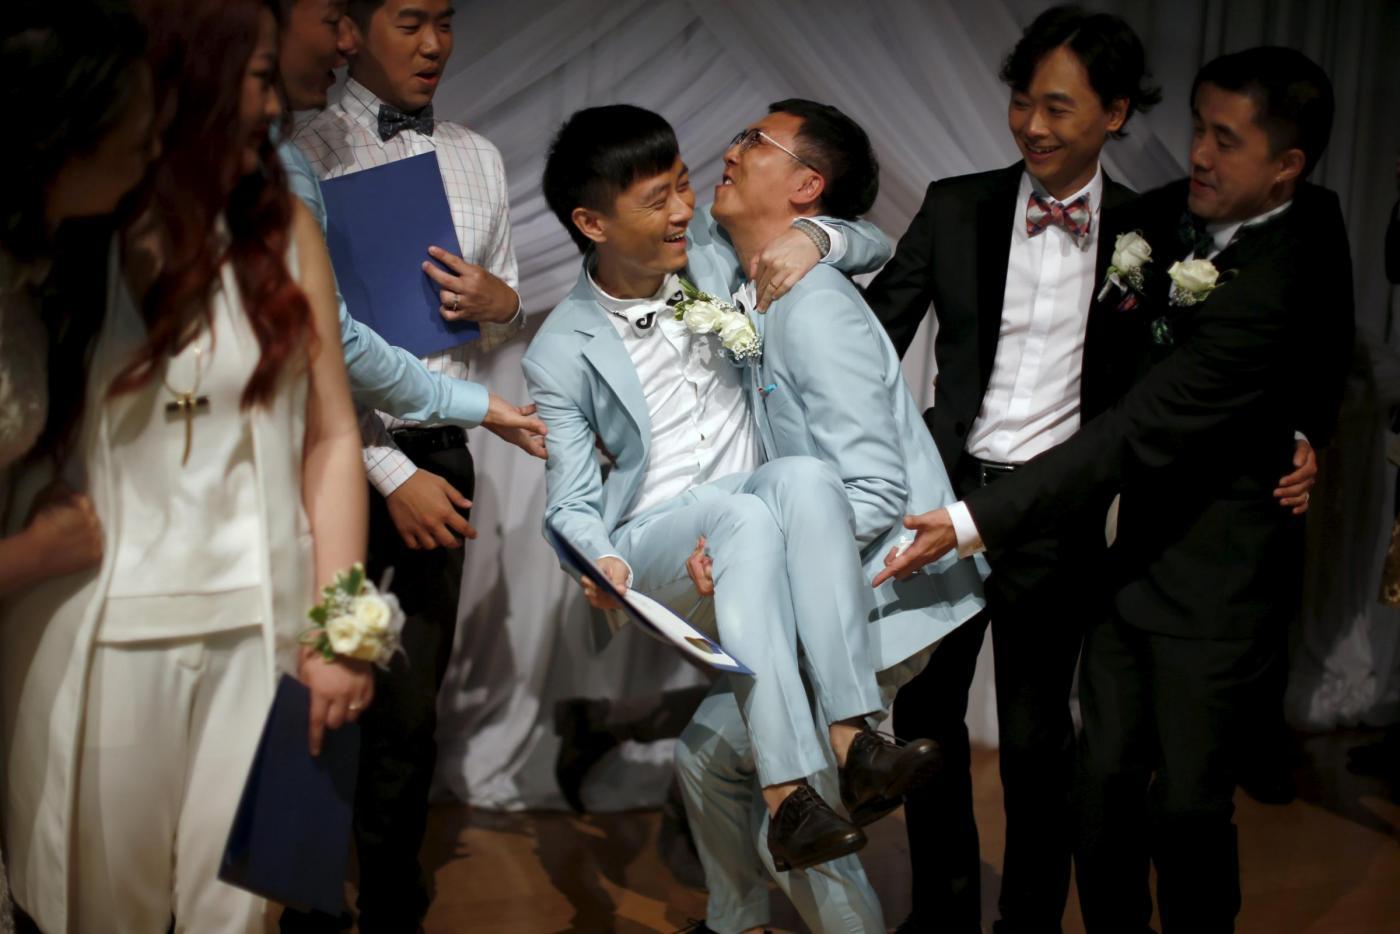 Sette coppie omosessuali cinesi si sposano a Los Angeles18